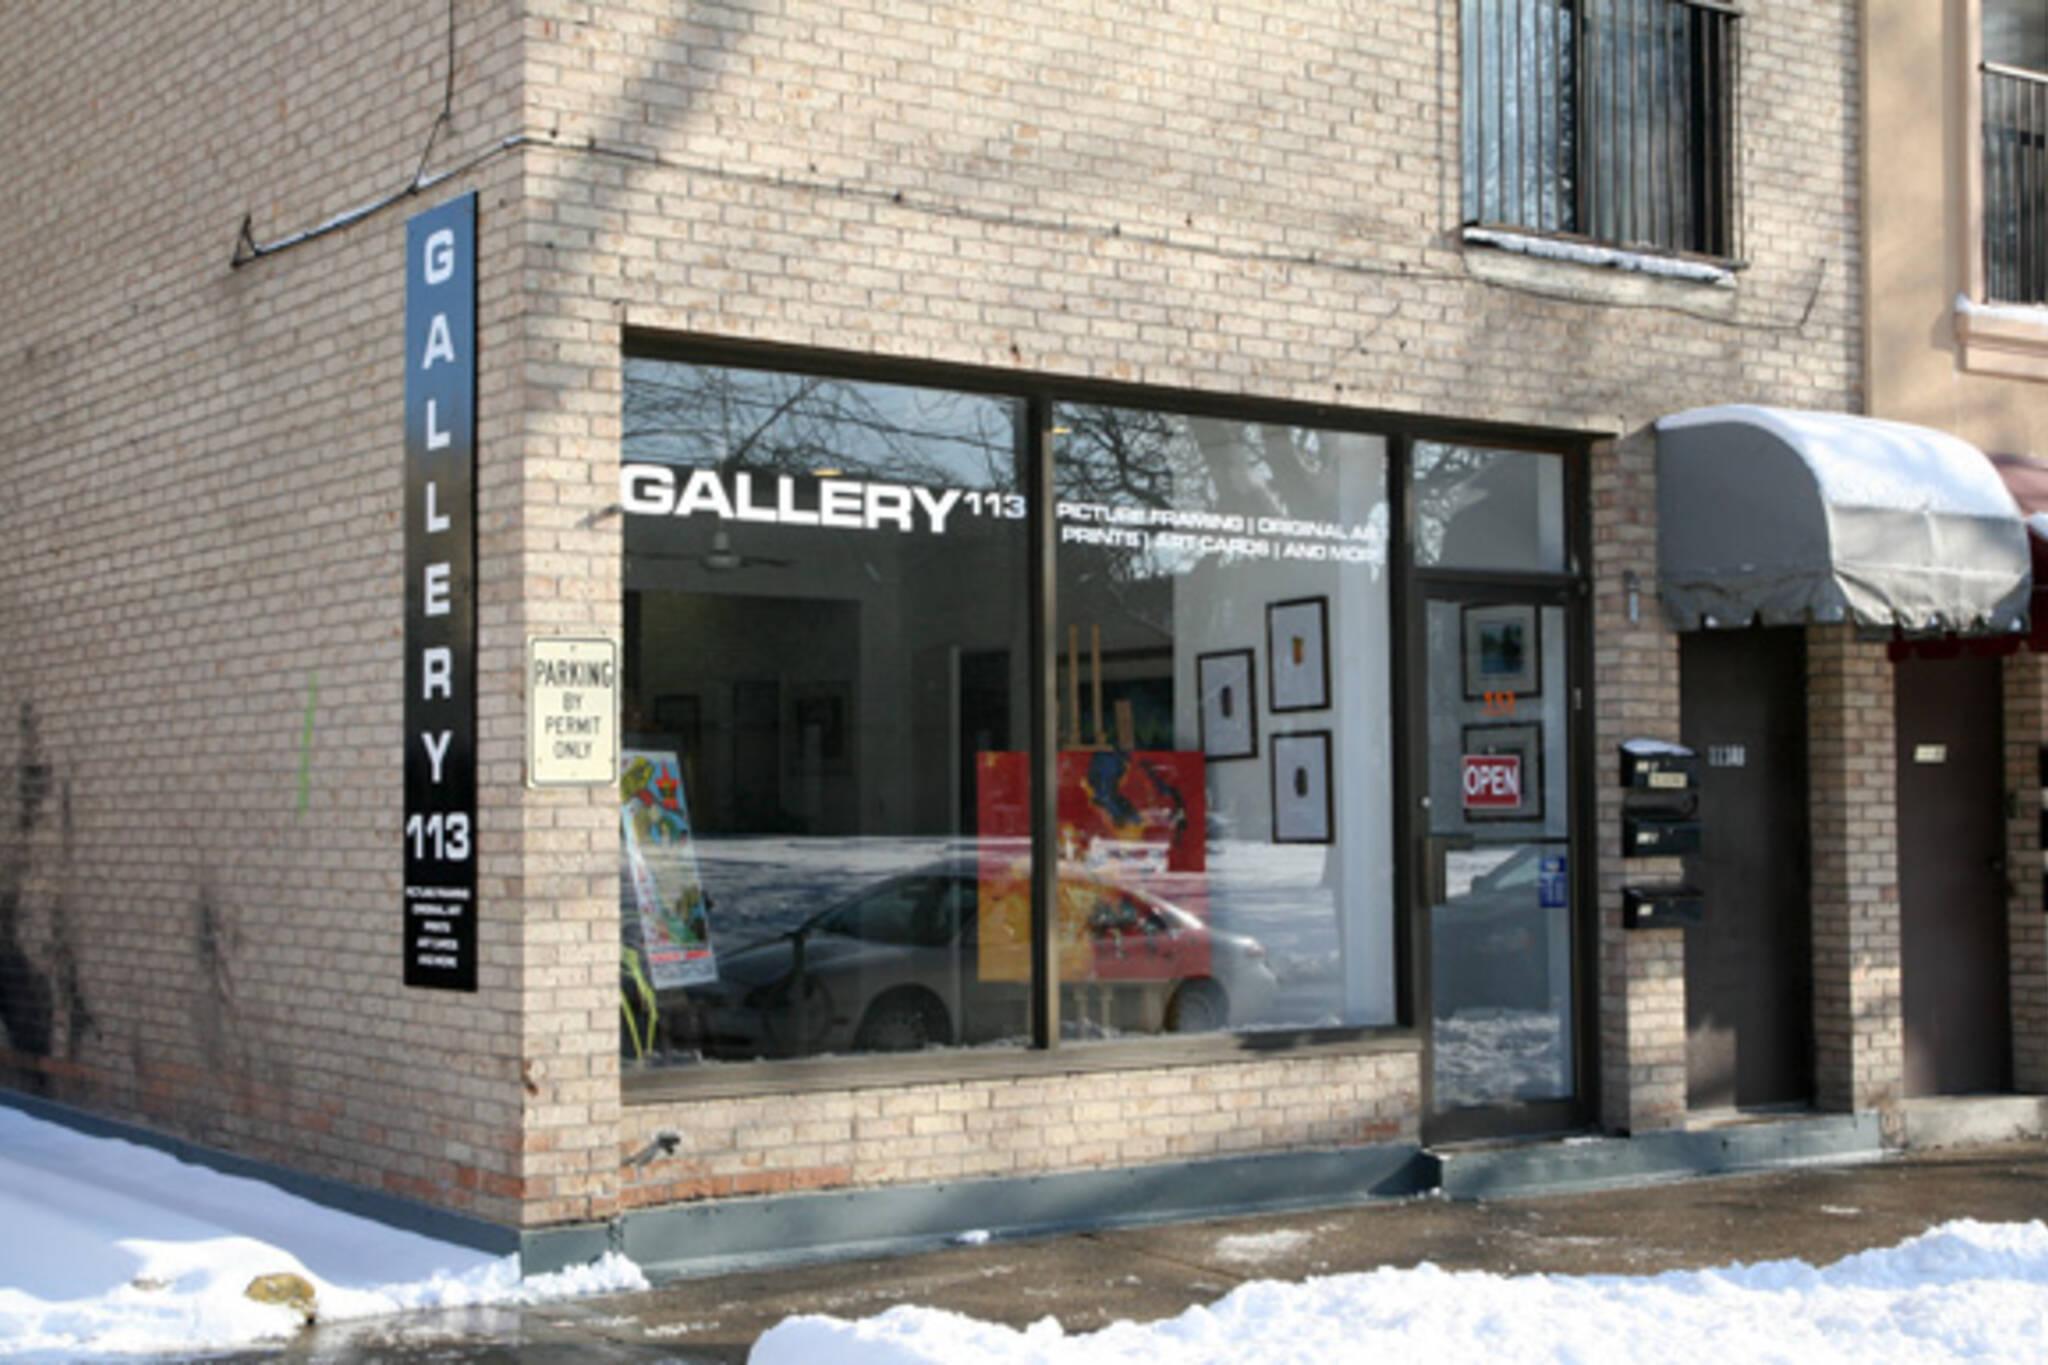 Gallery 113